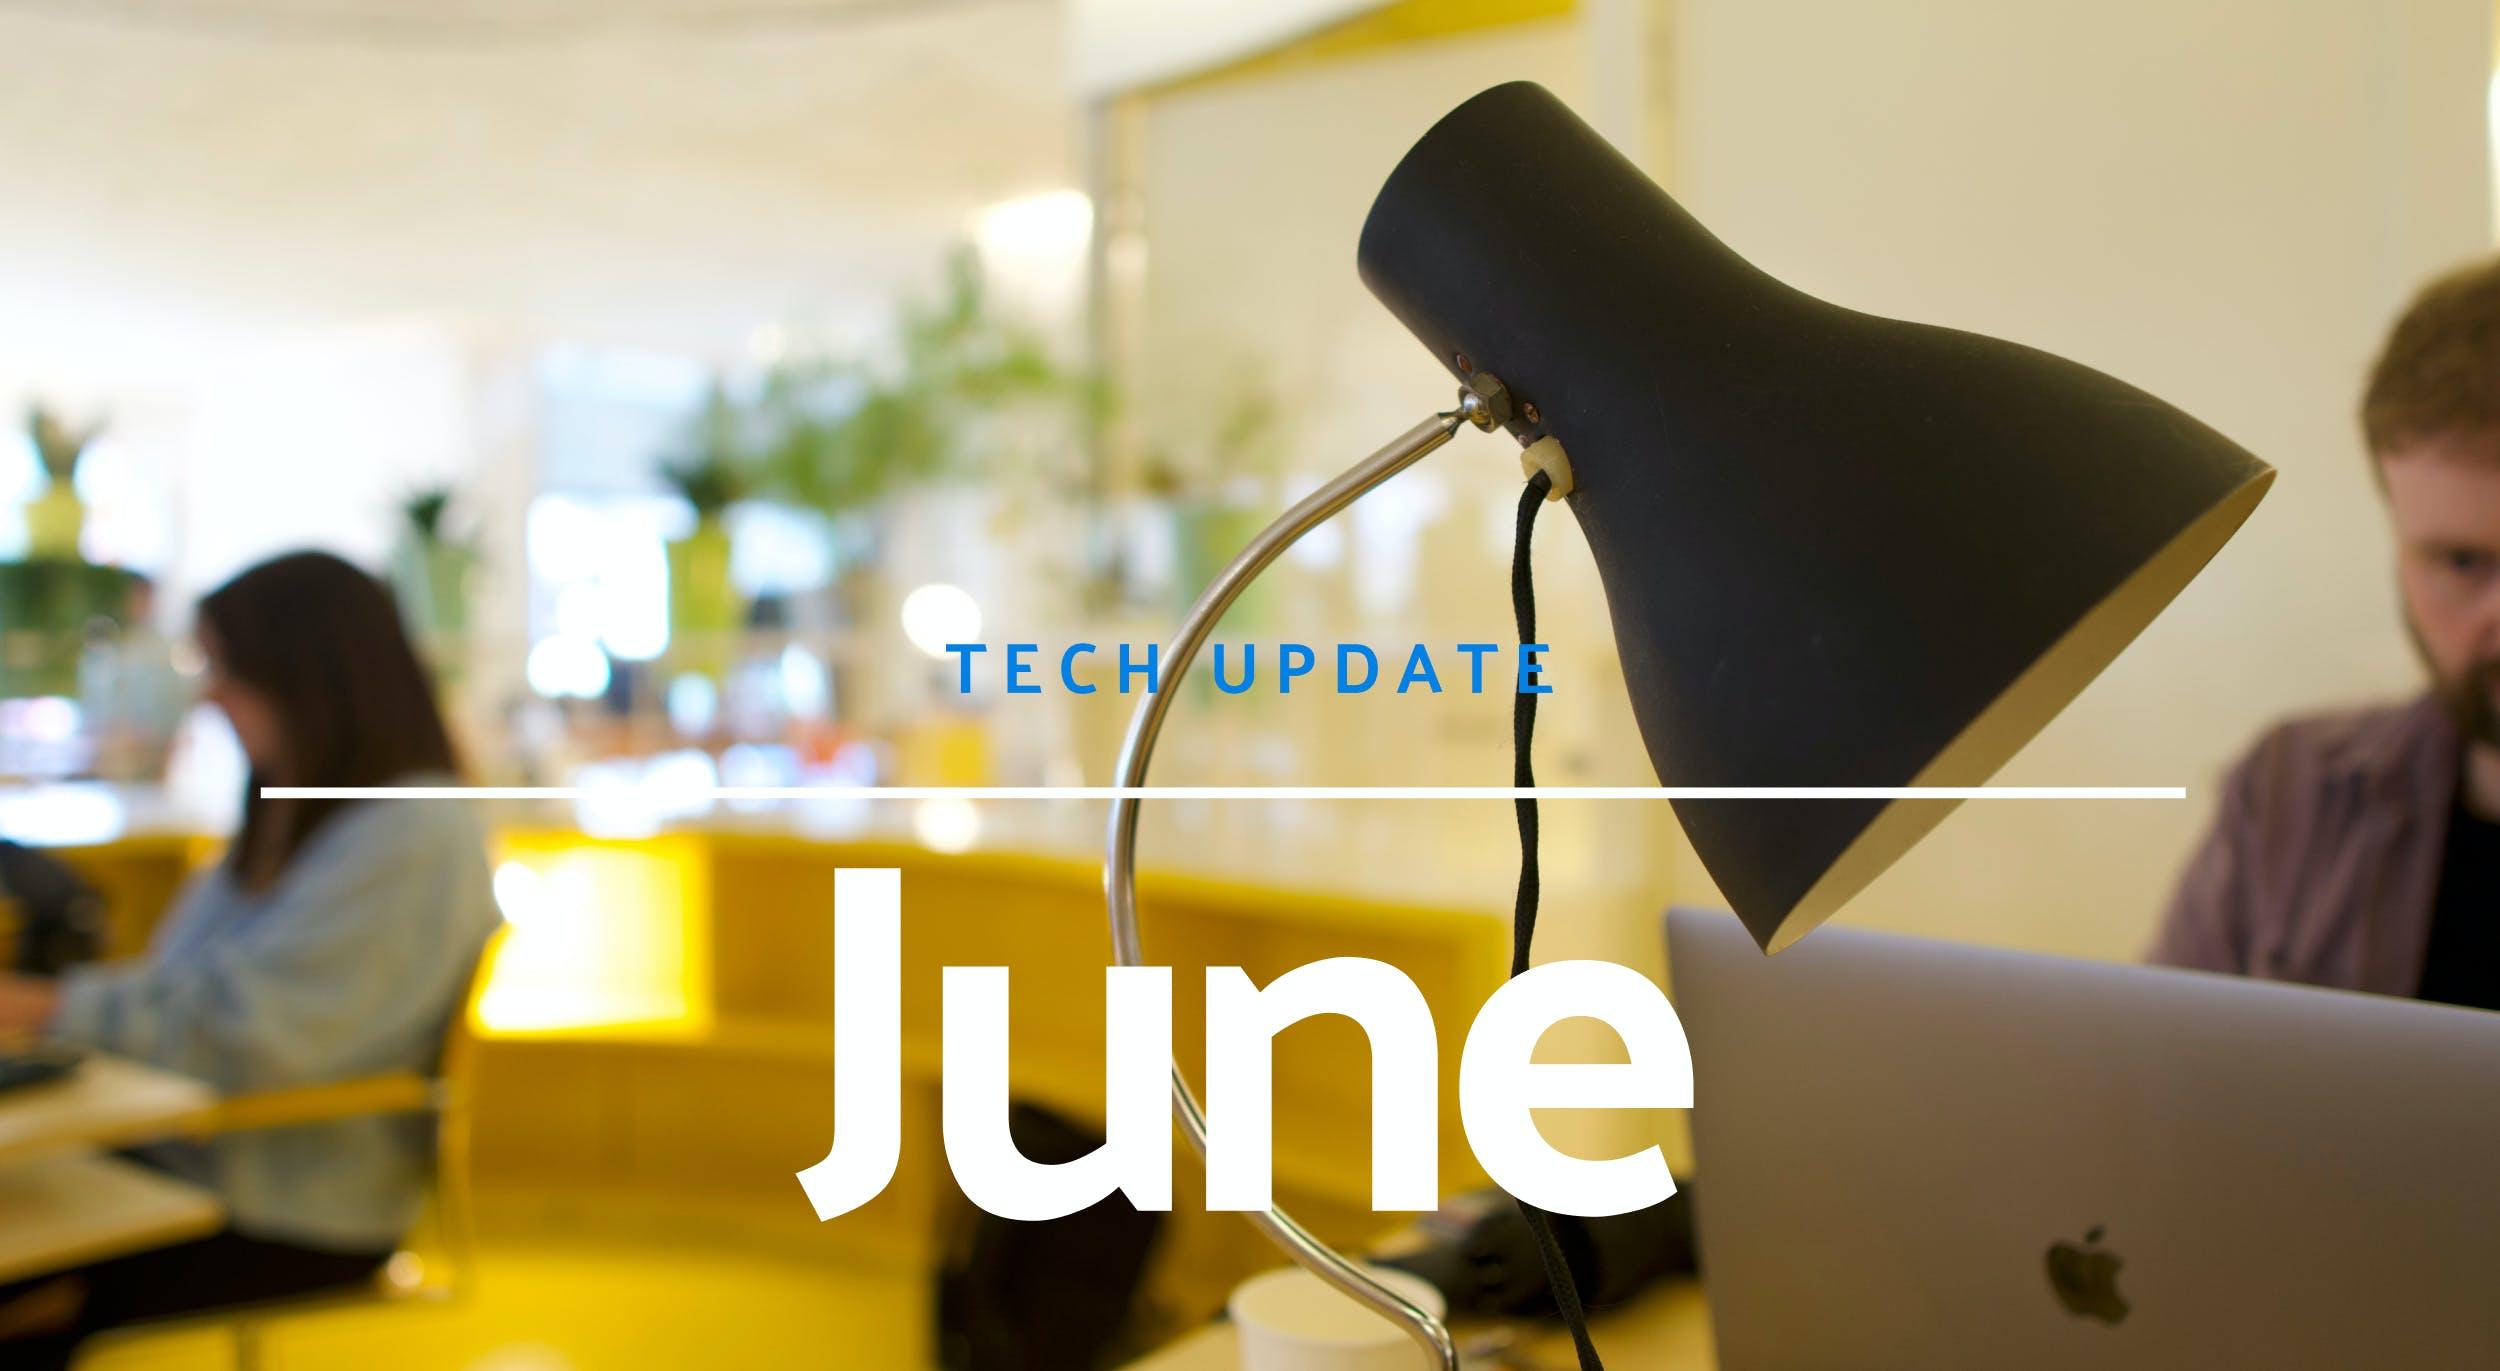 Technology update for June 2021